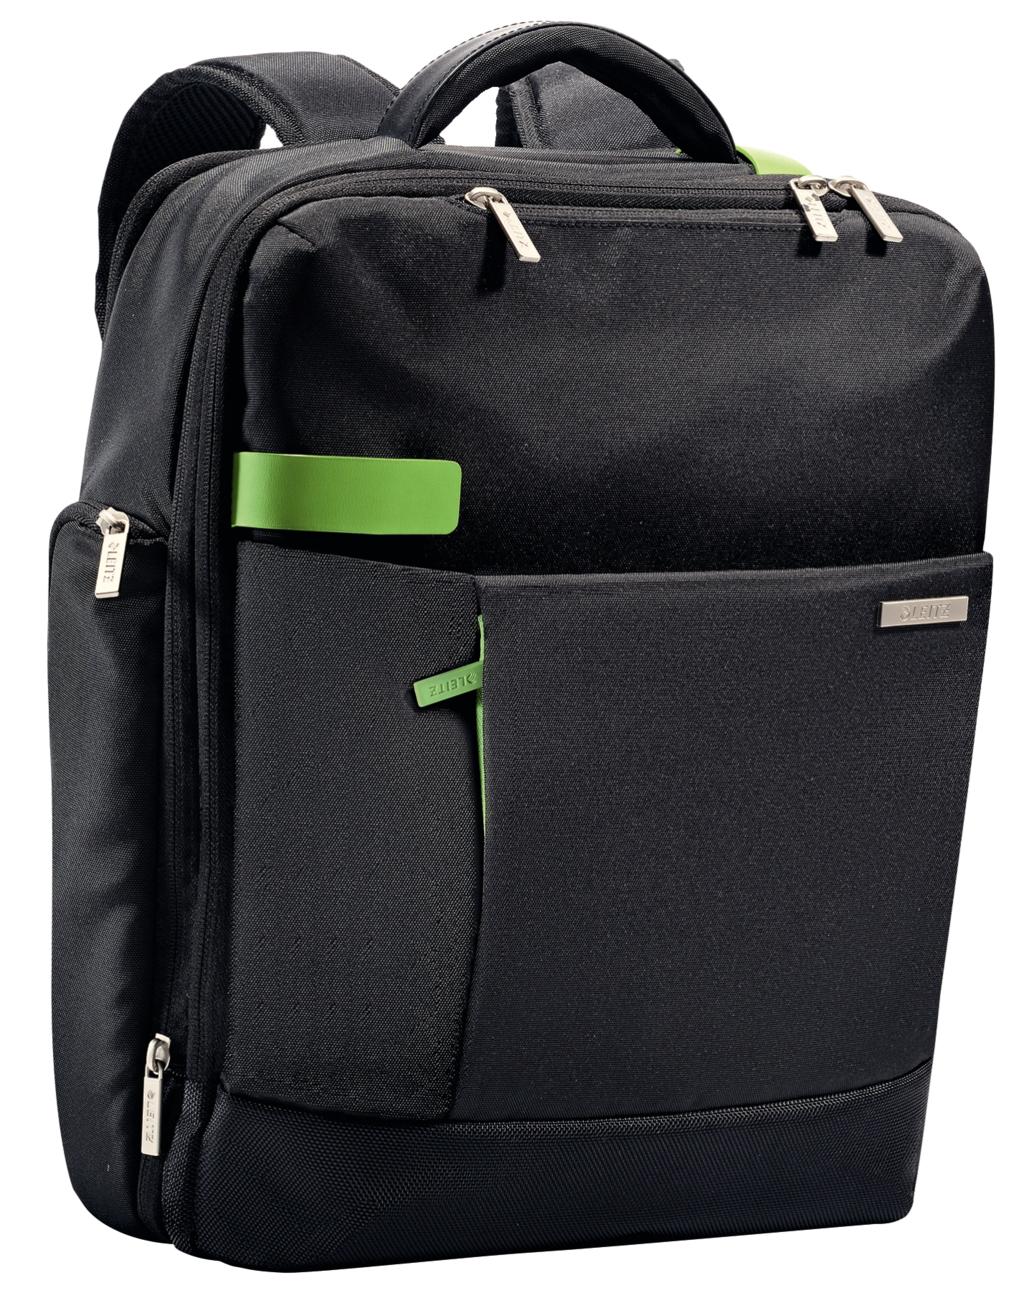 Zaino Smart Traveller per PC 15,6''